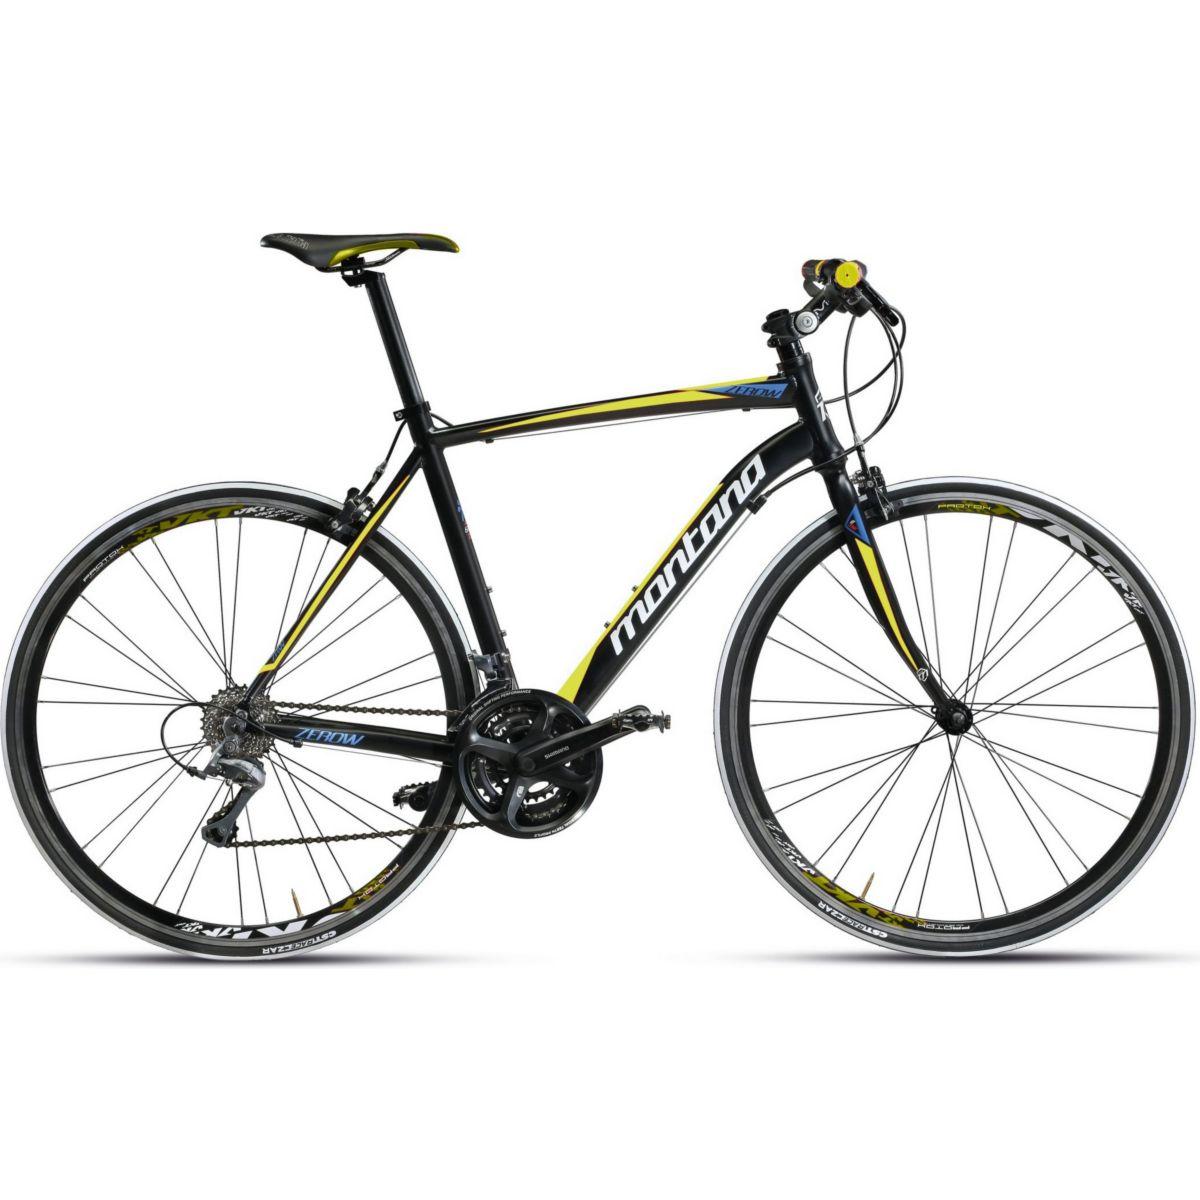 28 Zoll Montana Zerow Comfort Herren Rennrad Aluminium 24 Gang schwarz-gelb, 55cm jetztbilligerkaufen